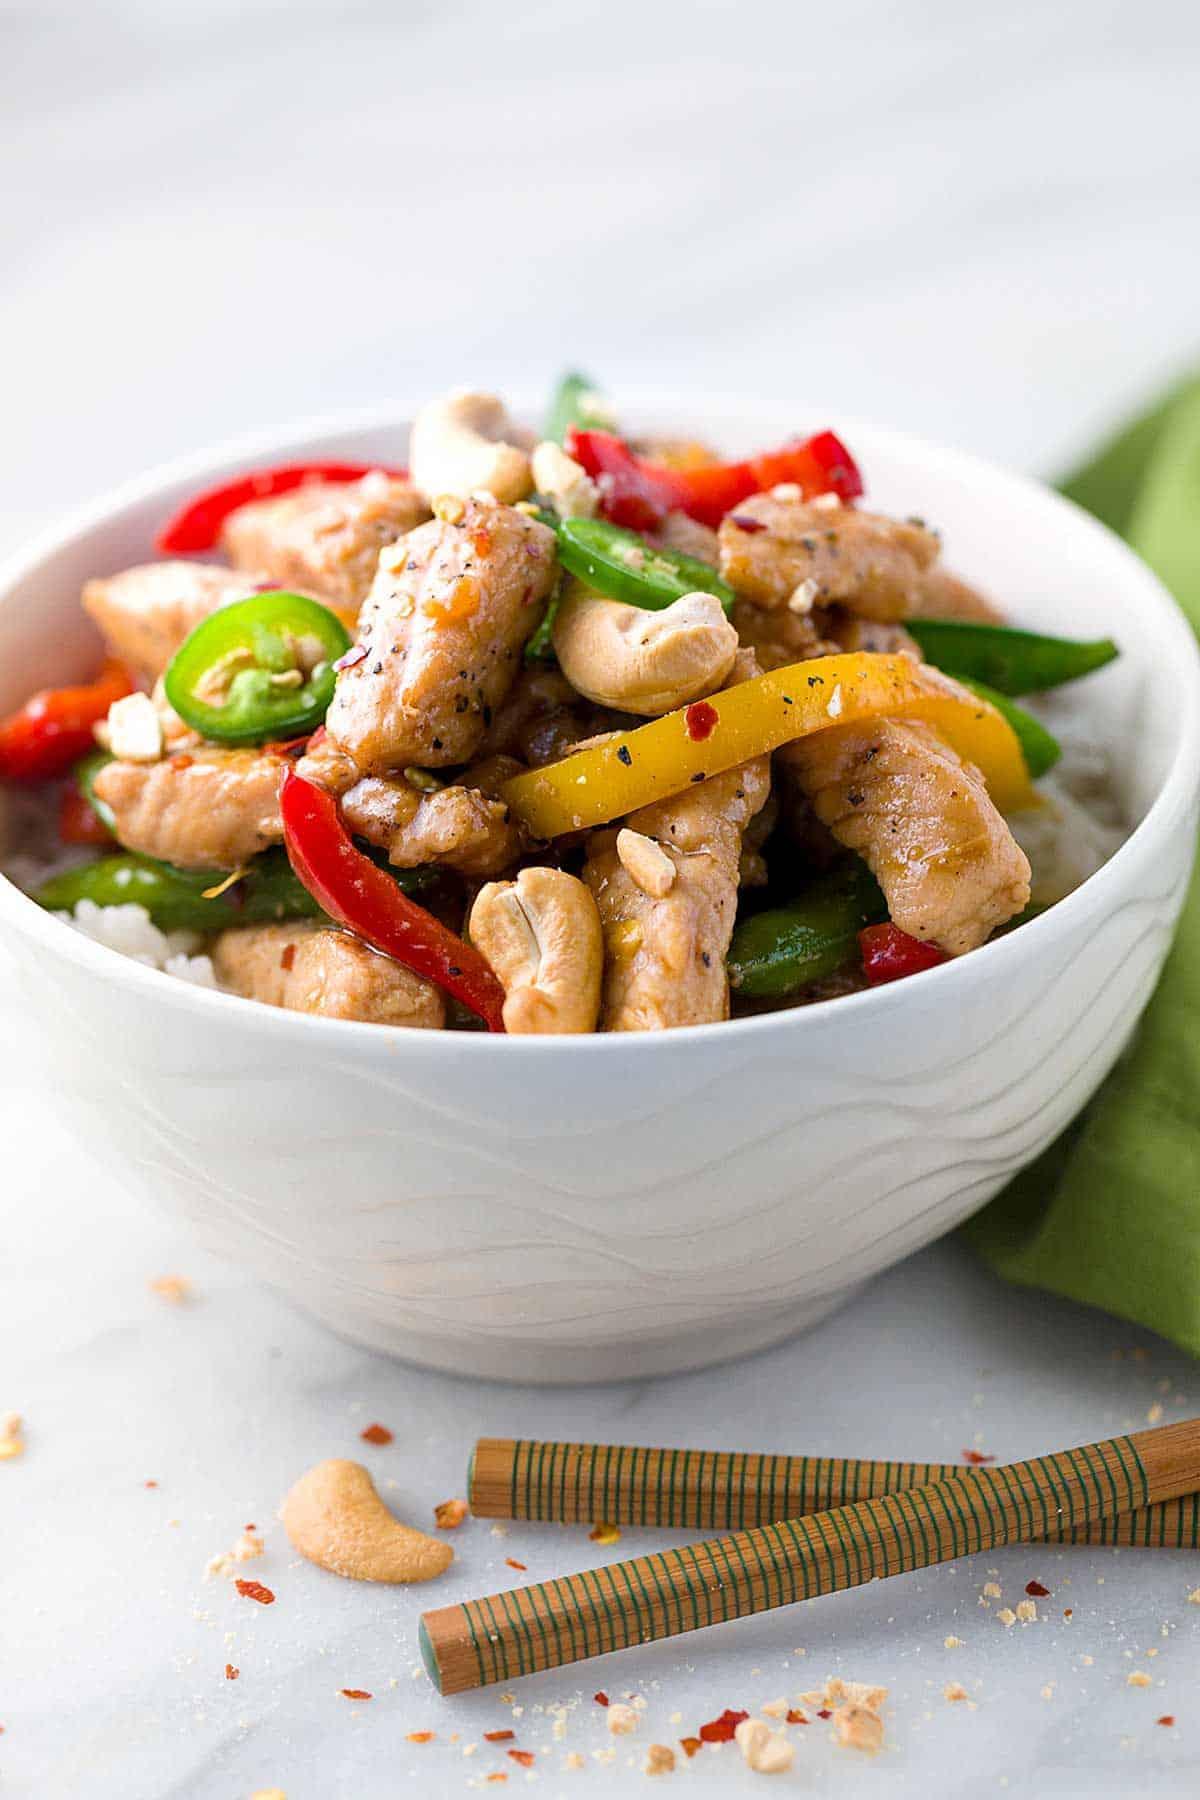 Pork stir-fry in a white bowl with chop sticks